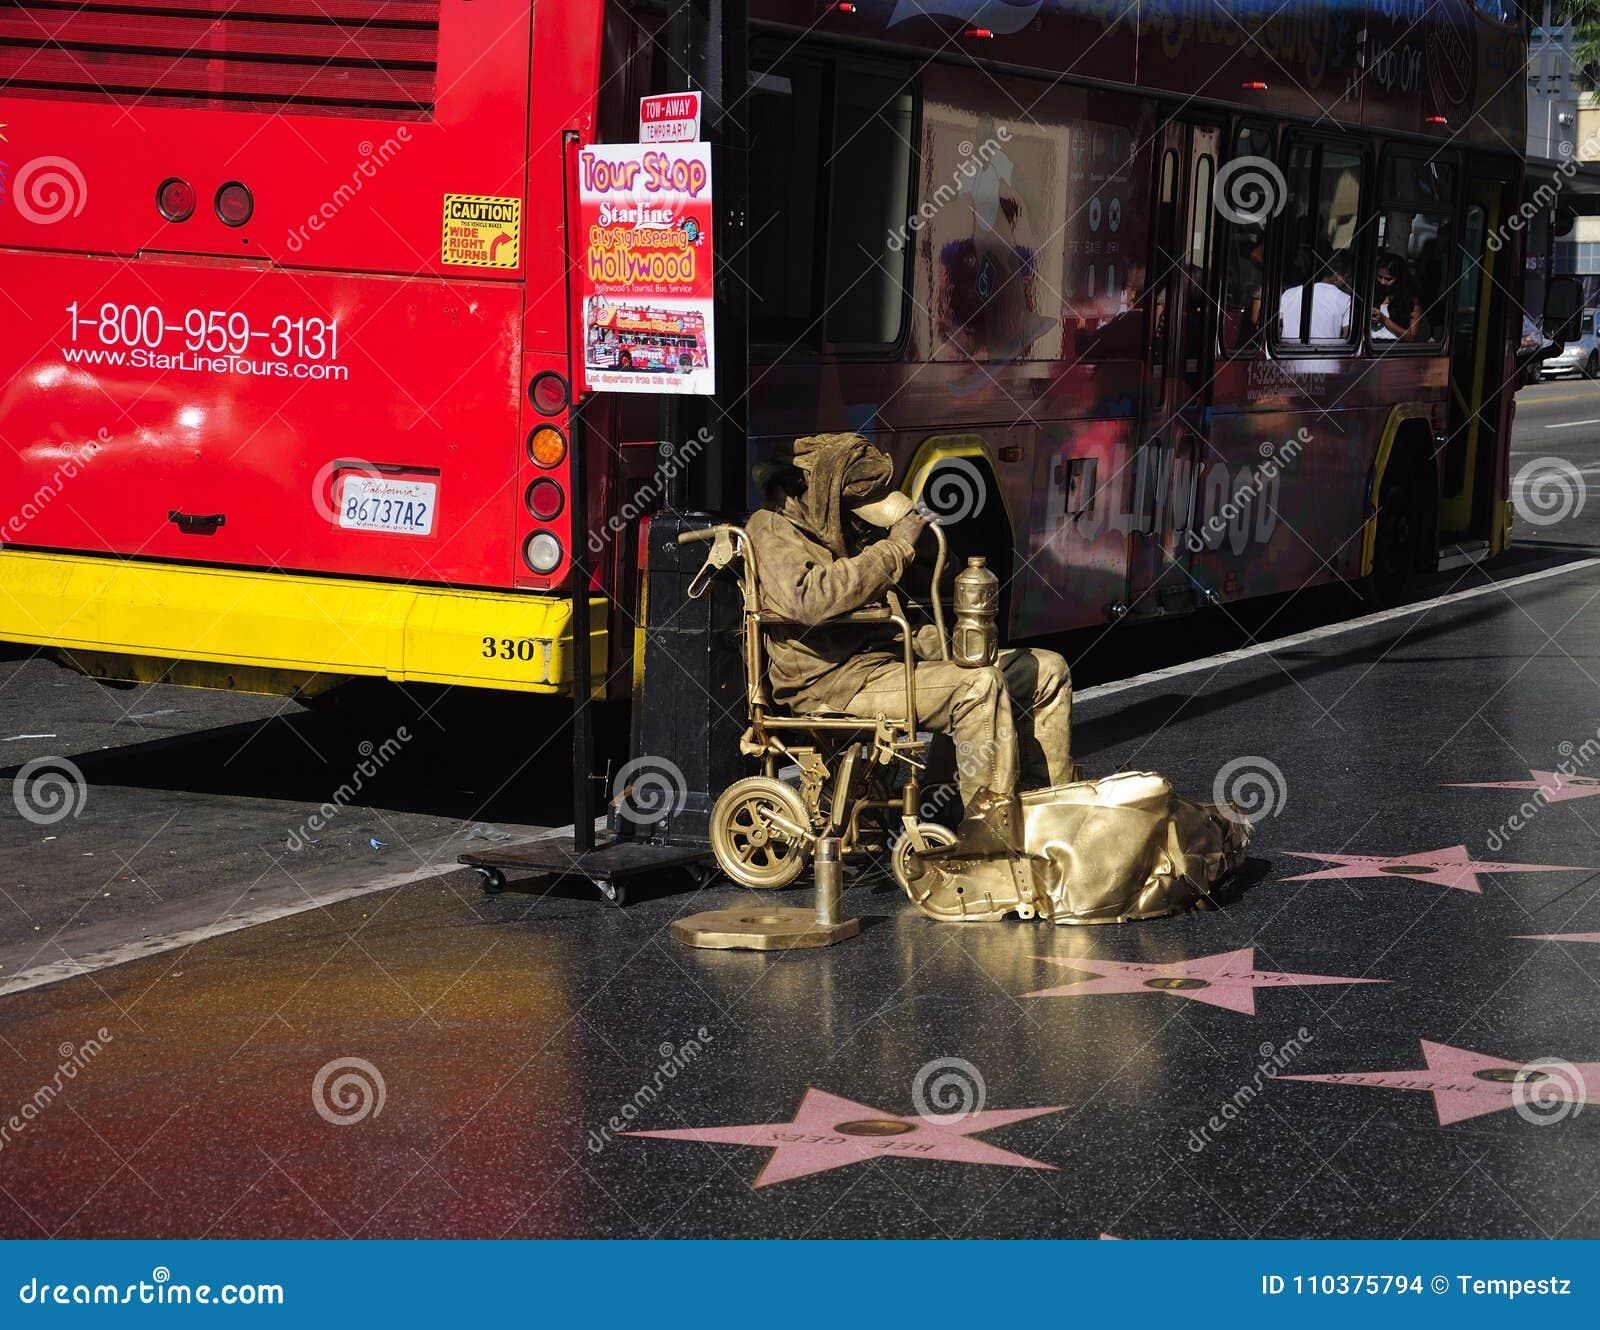 Hollywood Walk of Fame Gold Man Los Angeles